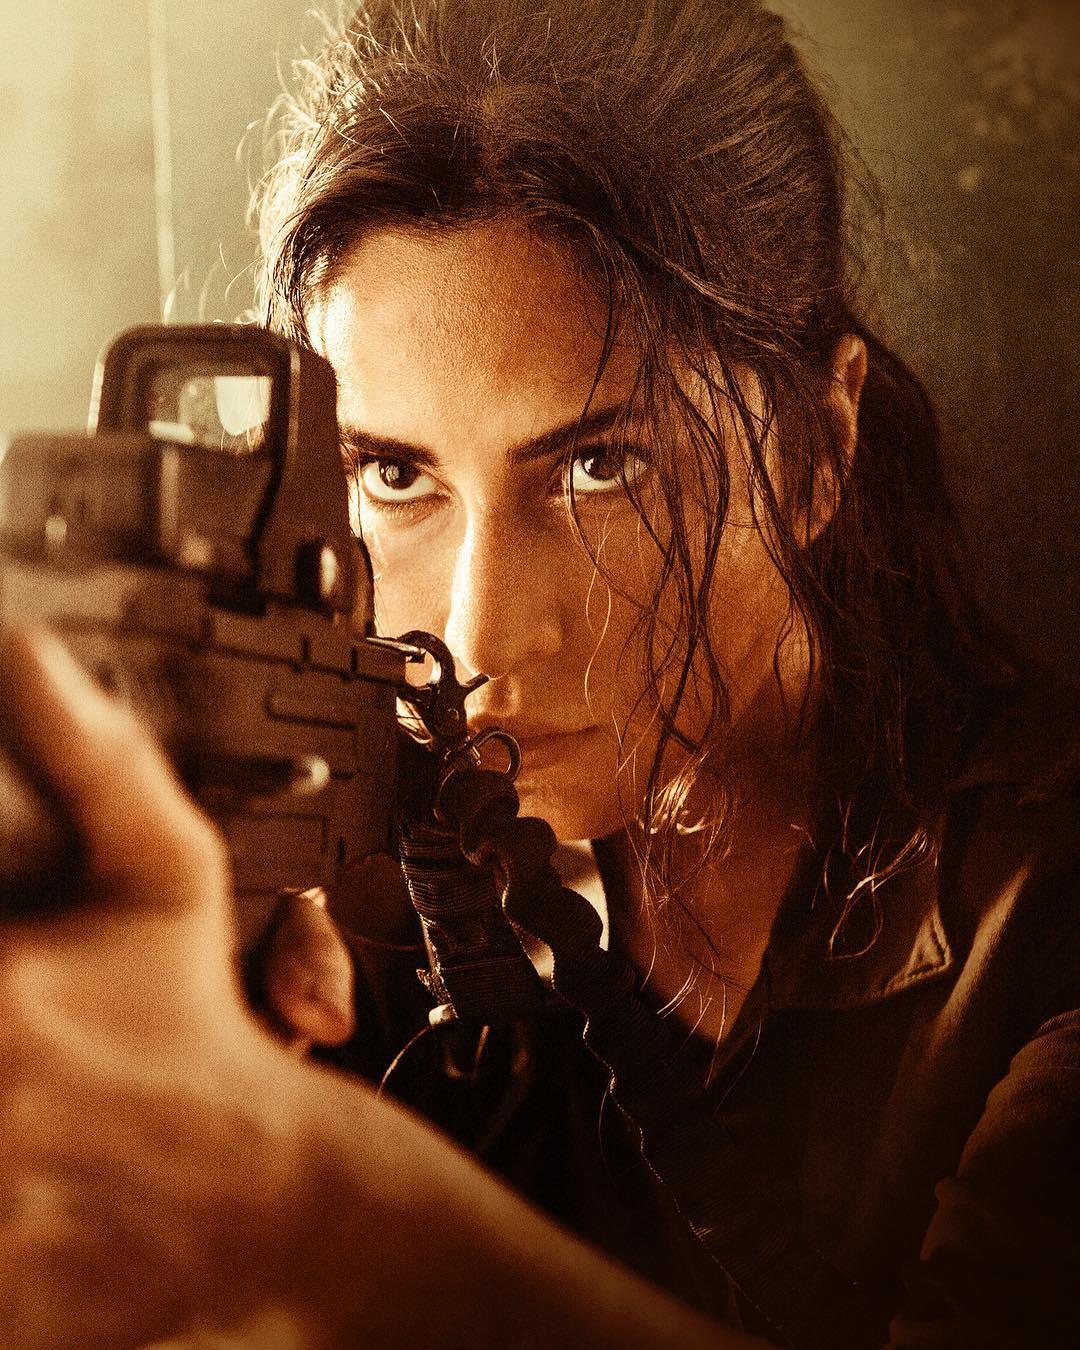 messy-hair-look-latest-trends-2018-katrina-kaif-best-bollywood-hairstyles-actress